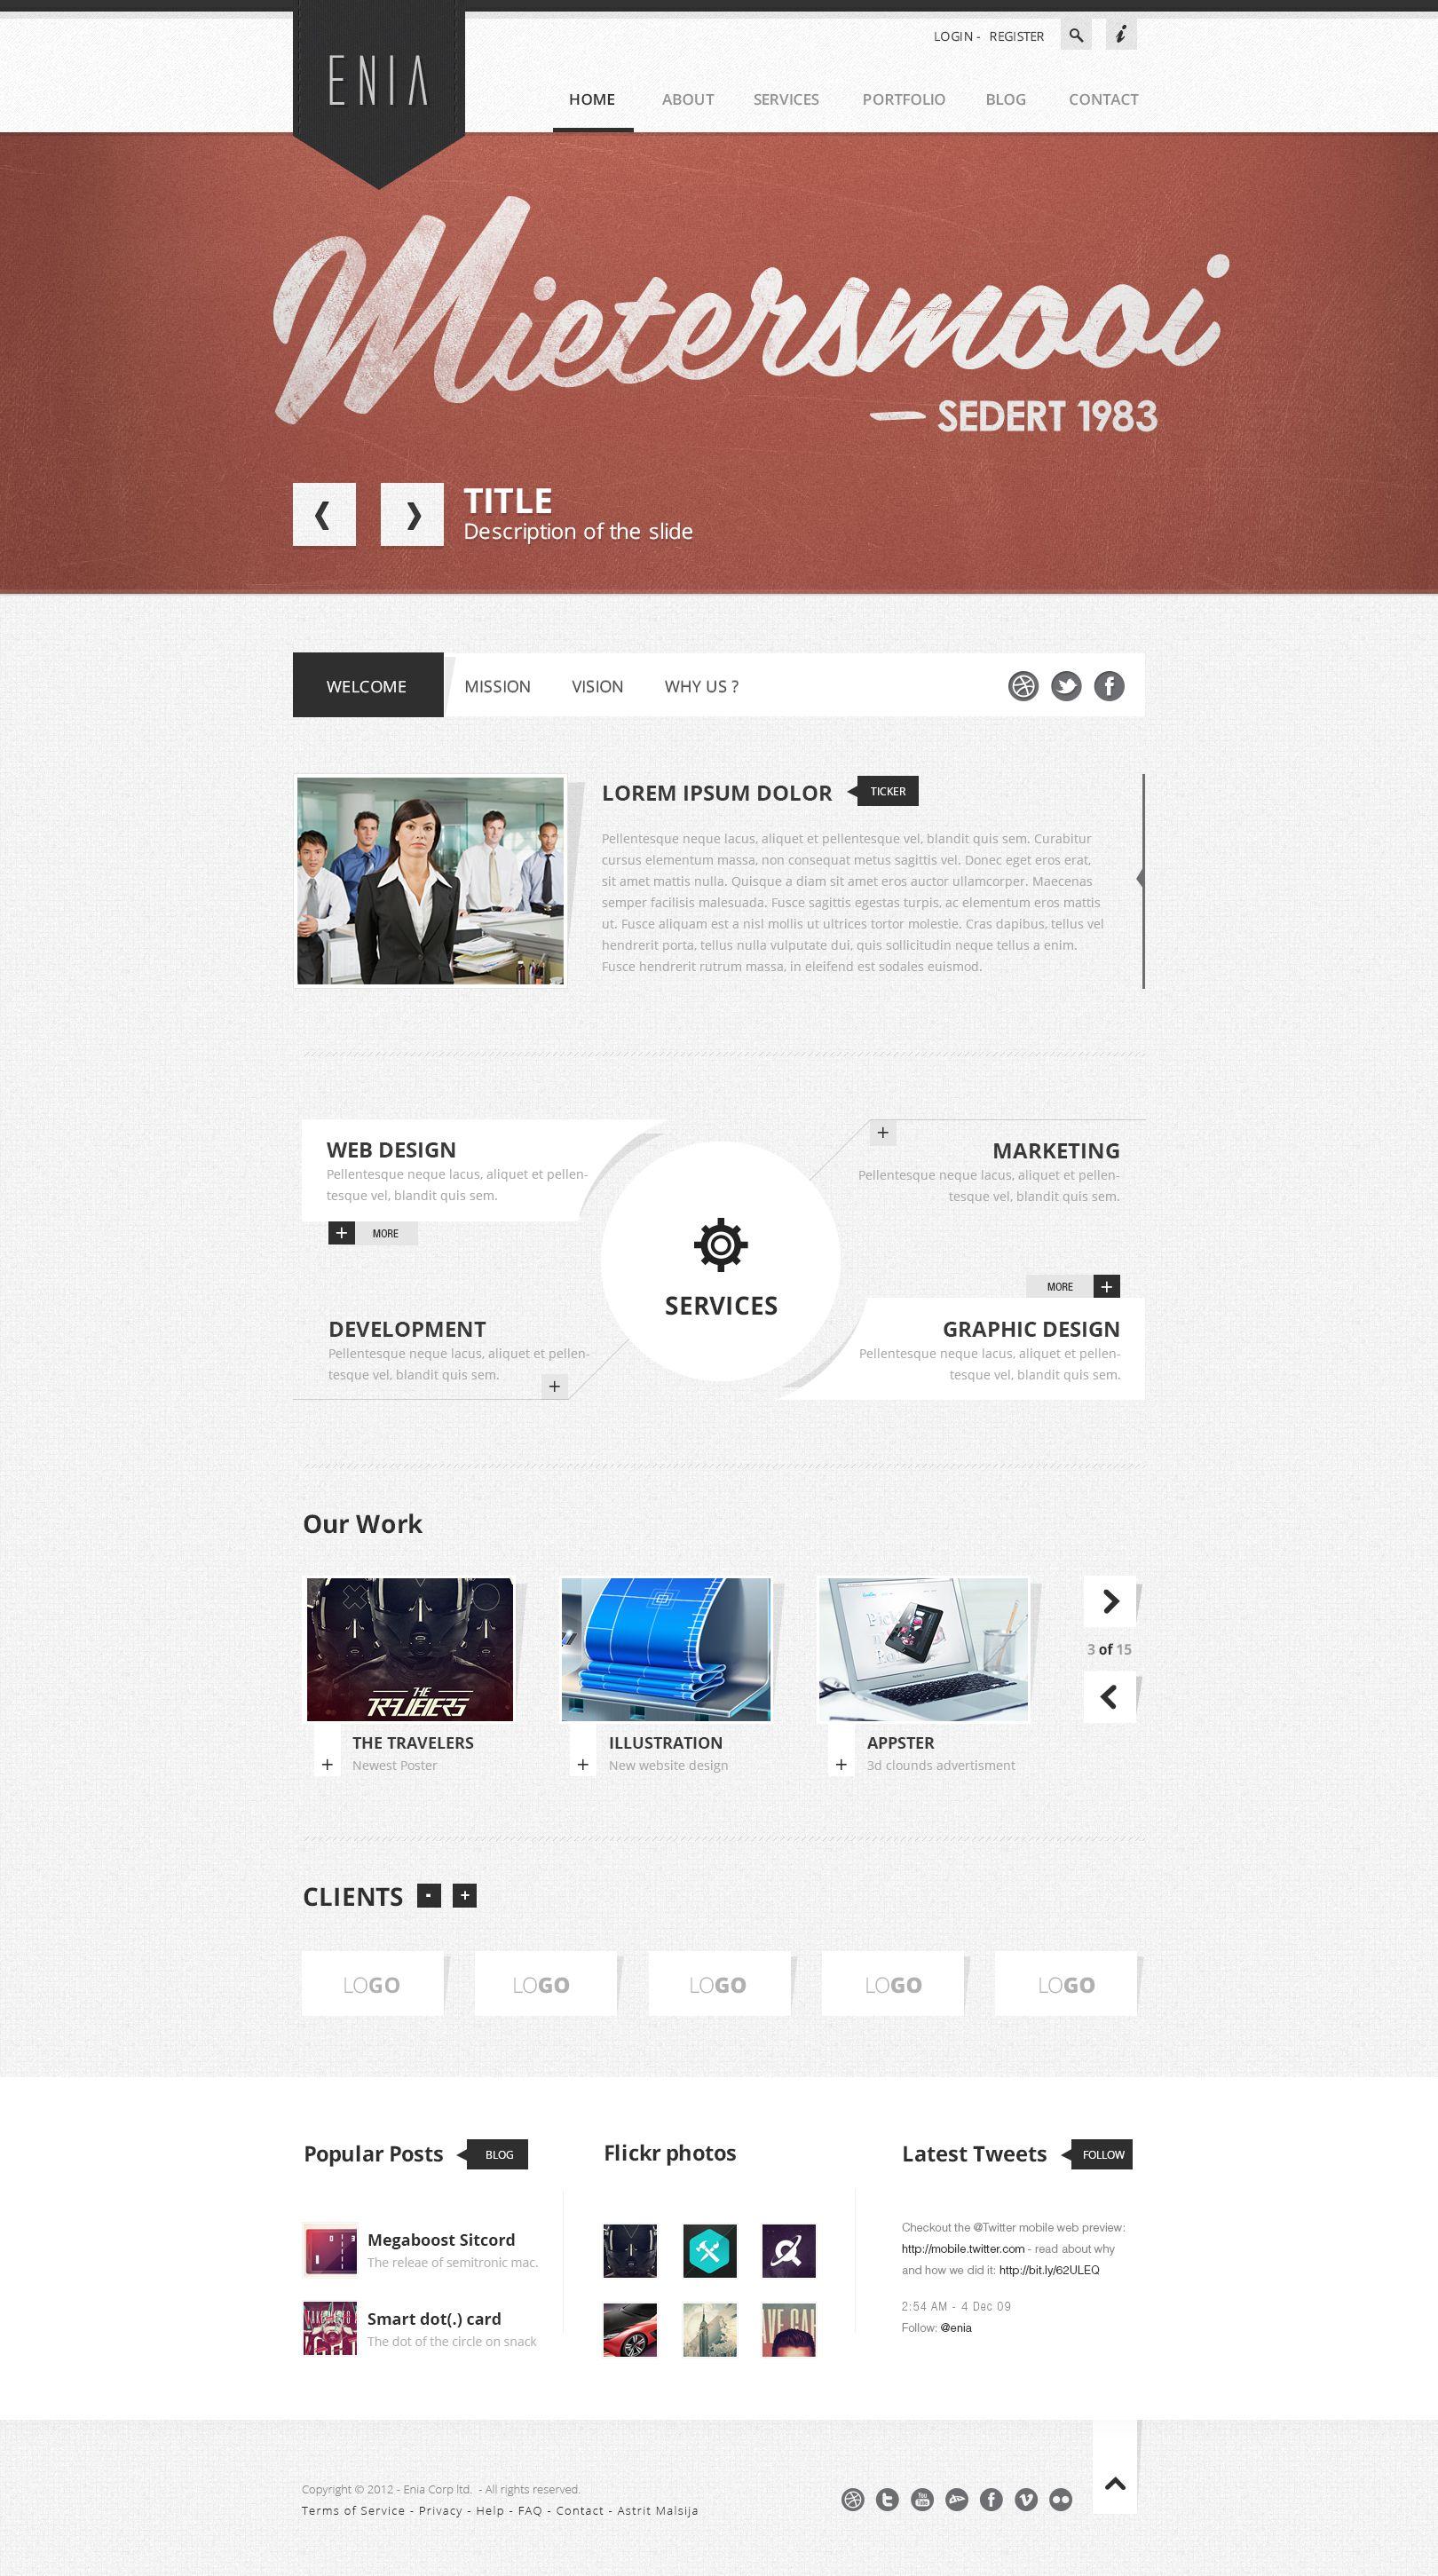 Enia - Professional PSD template by ~blottah on deviantART